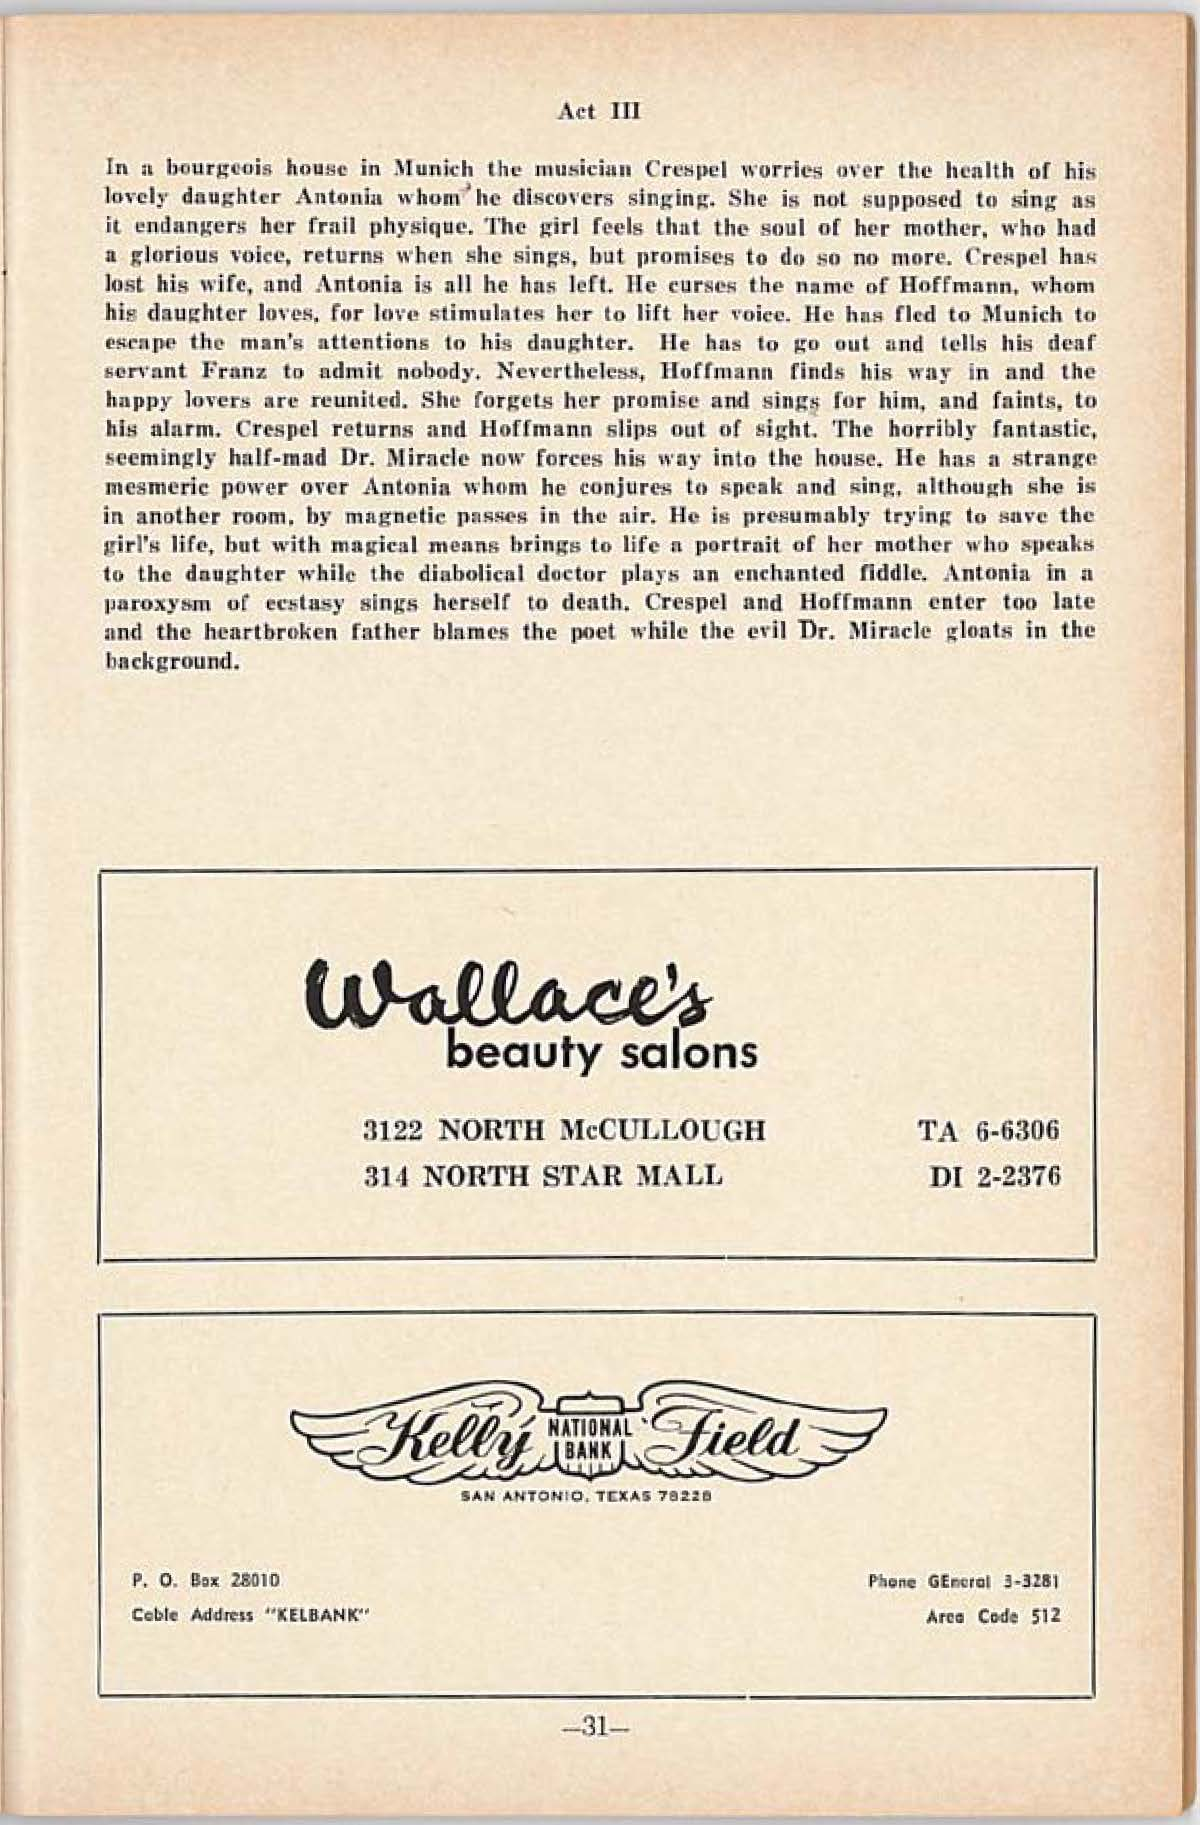 1968 Program_Page_15.jpg